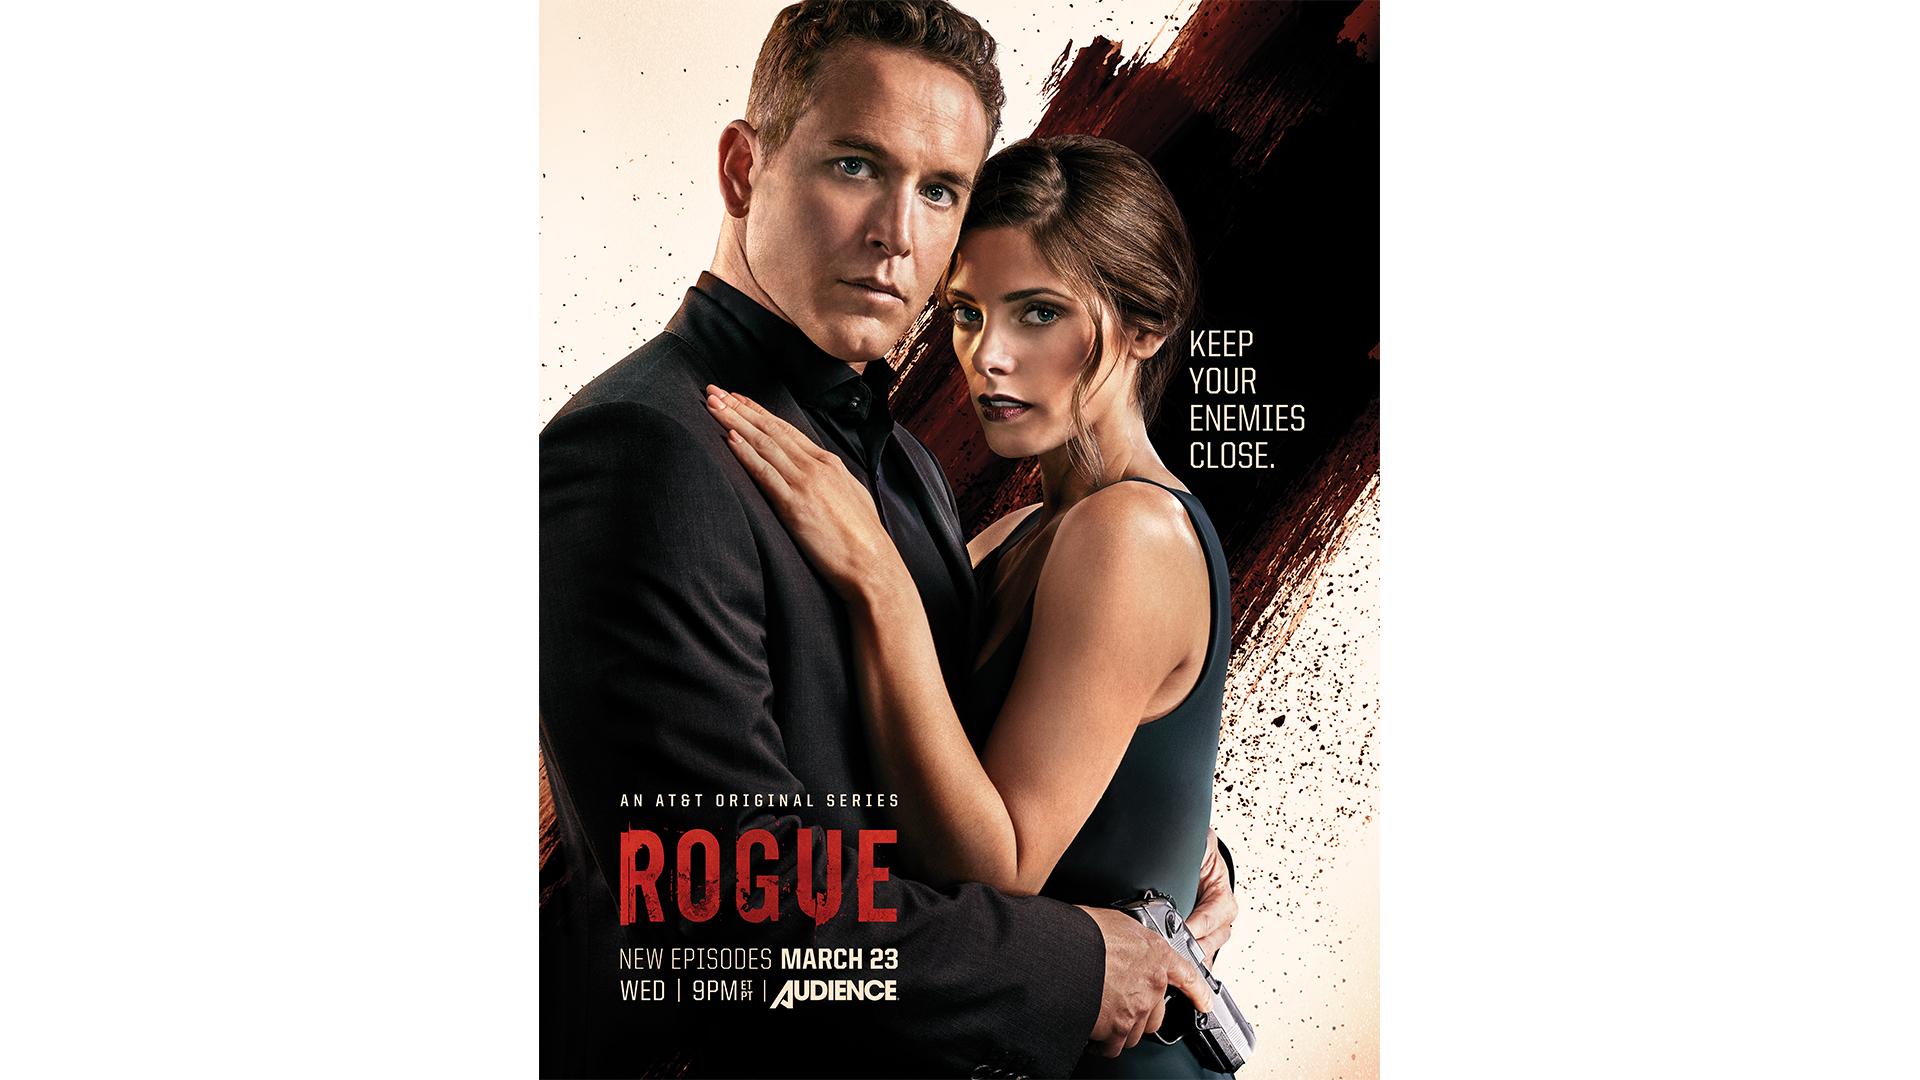 RogueS3_01-1.jpg